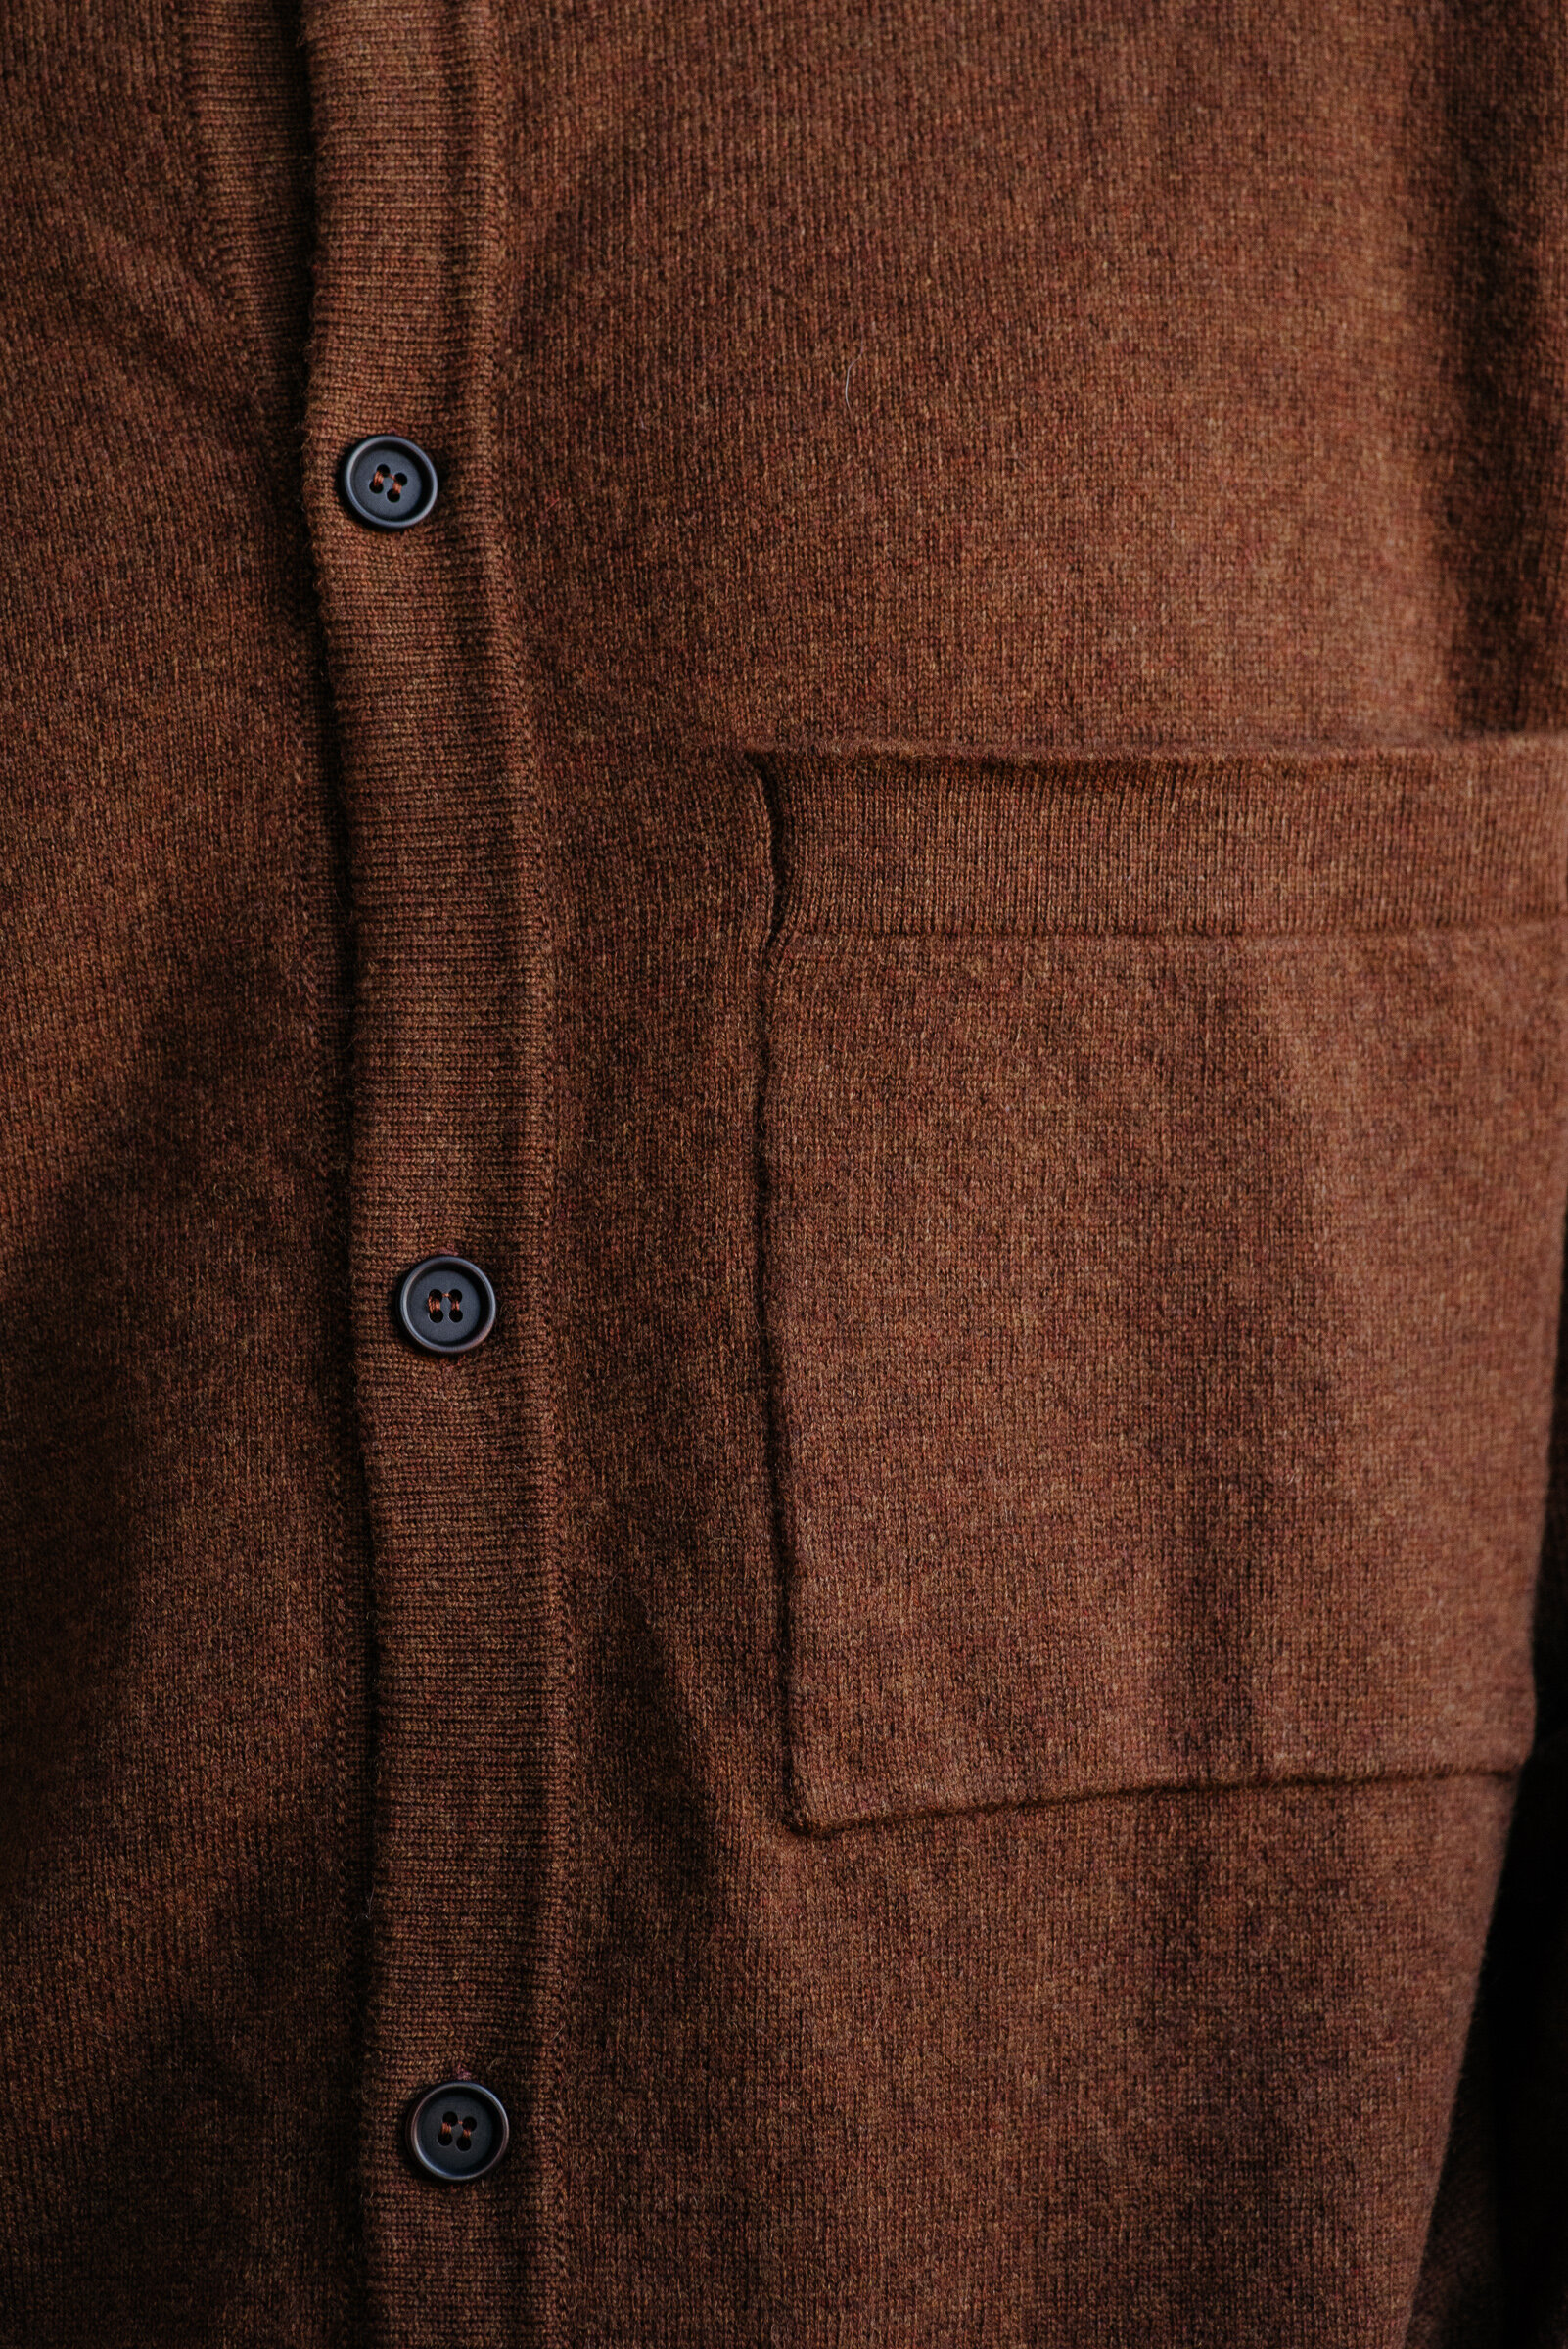 evan-kinori-knit-shirt-cashmere-lambswool-made-in-italy-25